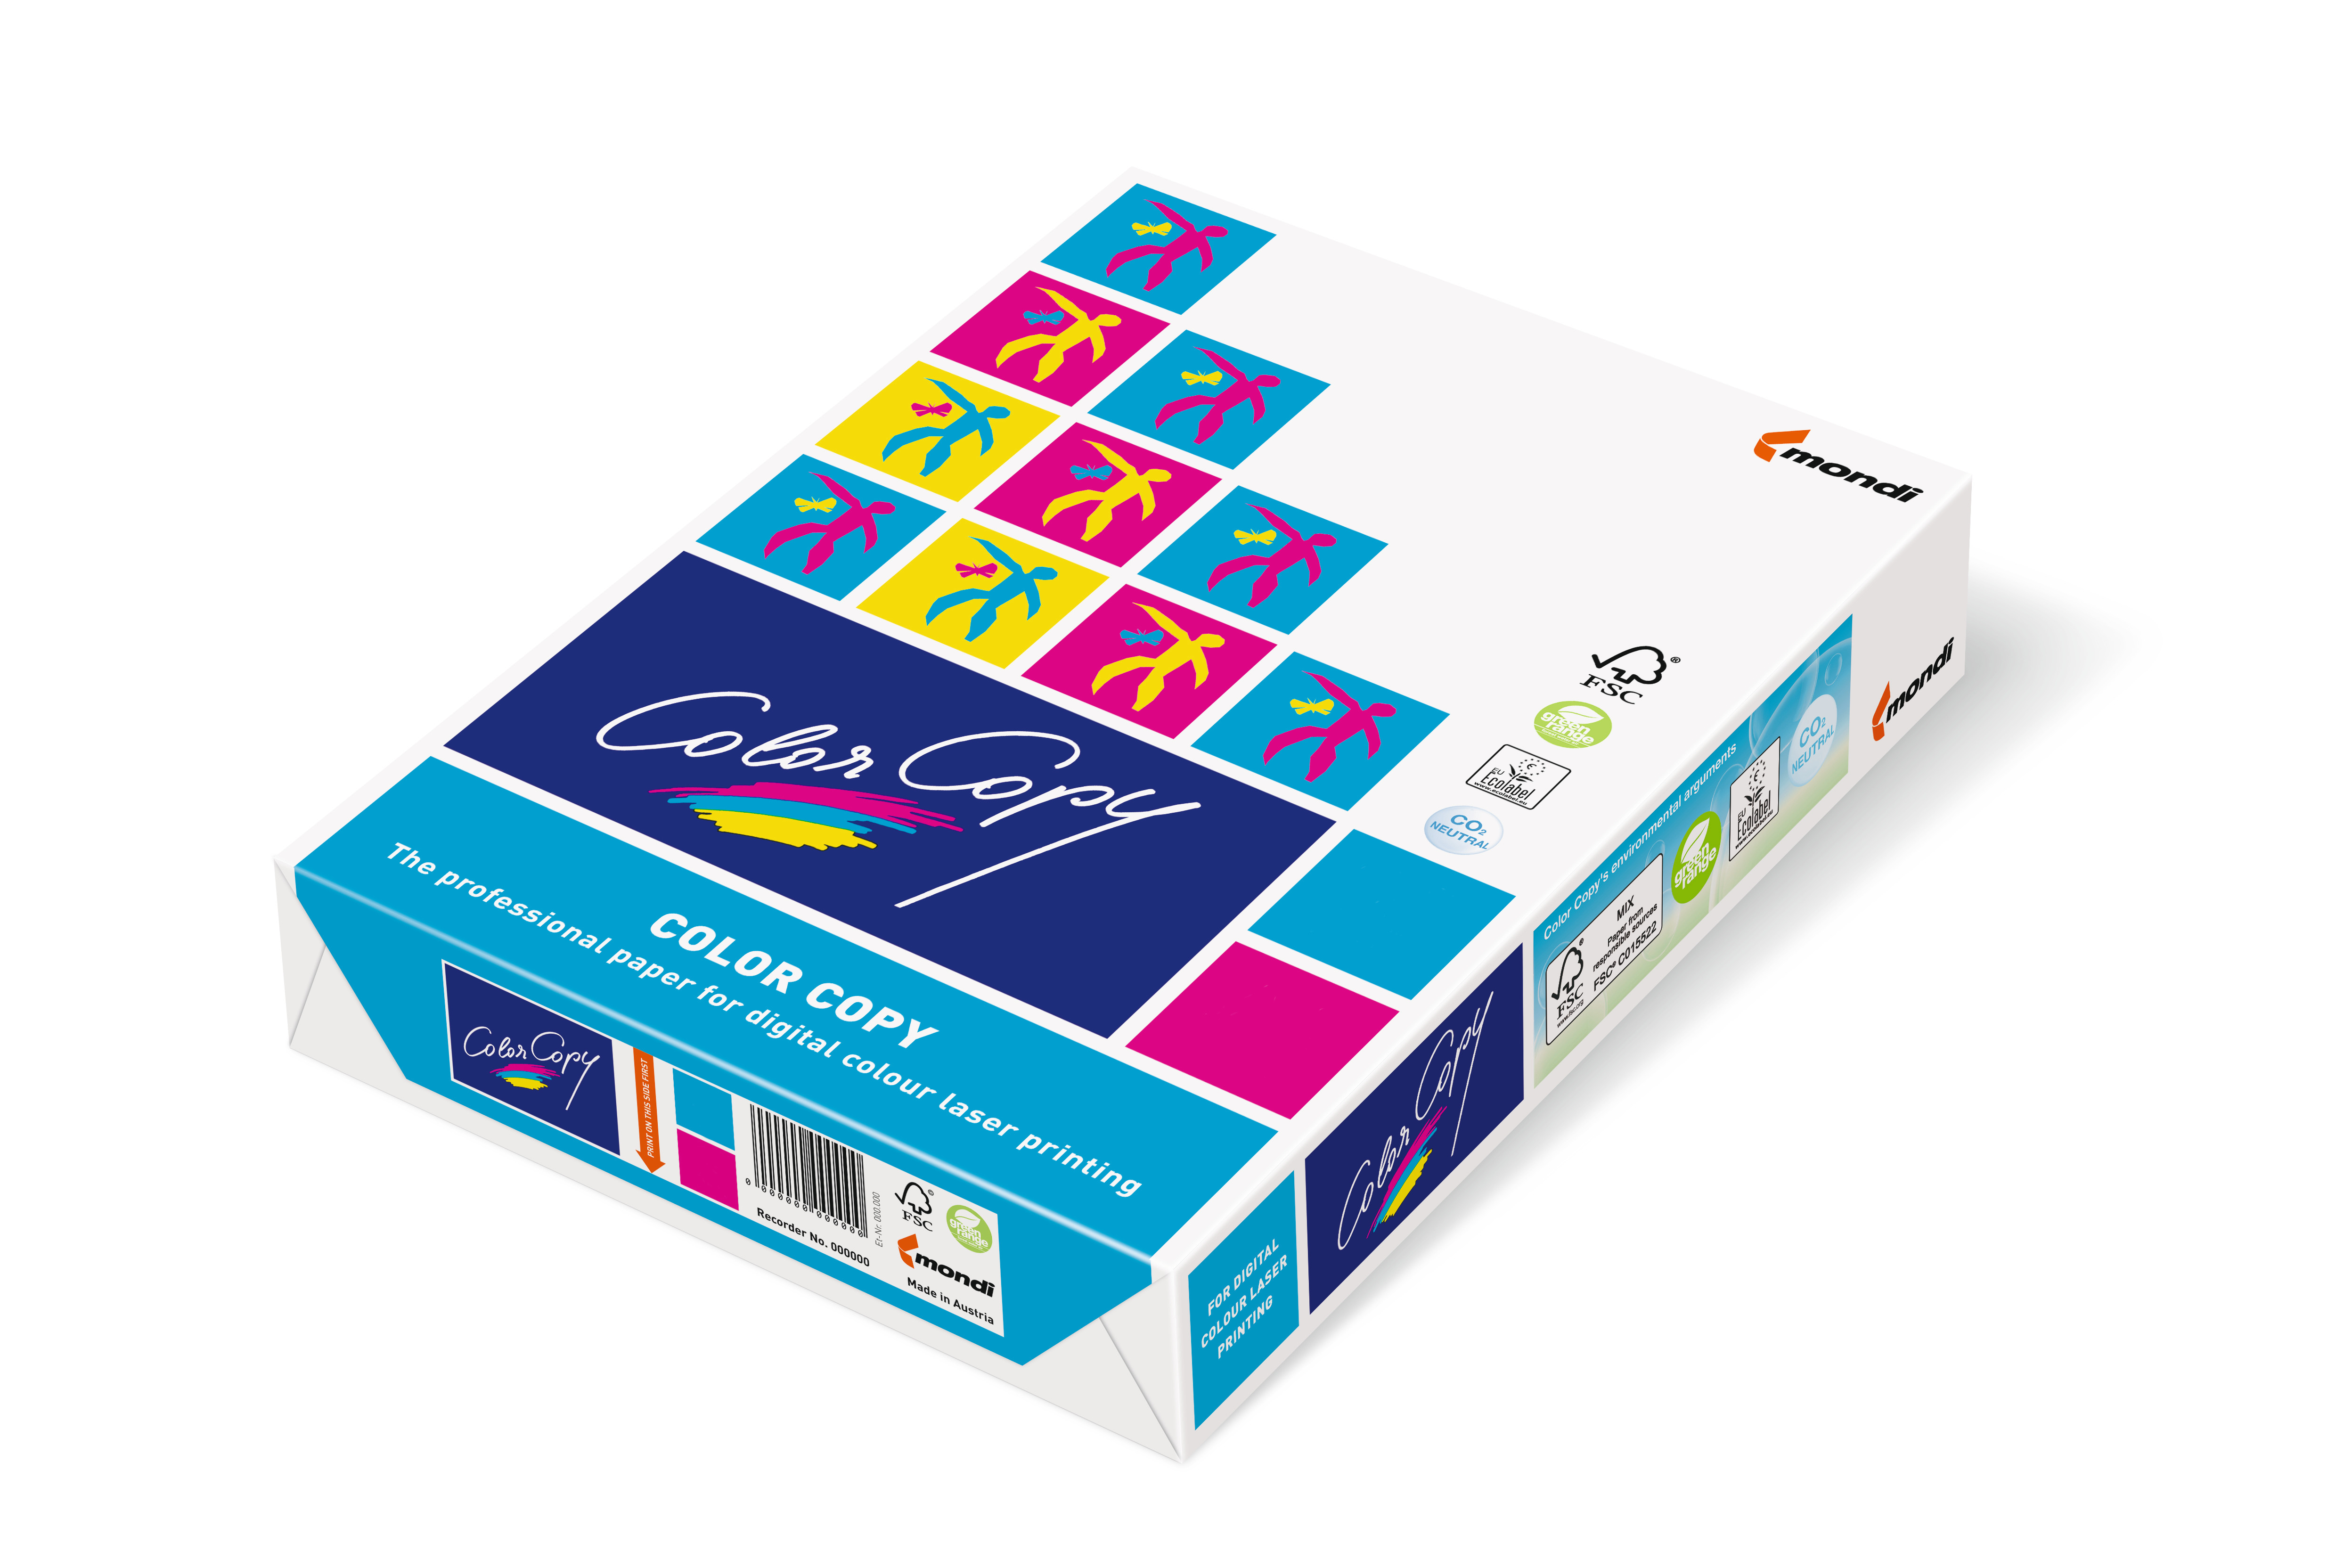 Mondi Color Copy 220 g/m² DIN-A4 250 Blatt